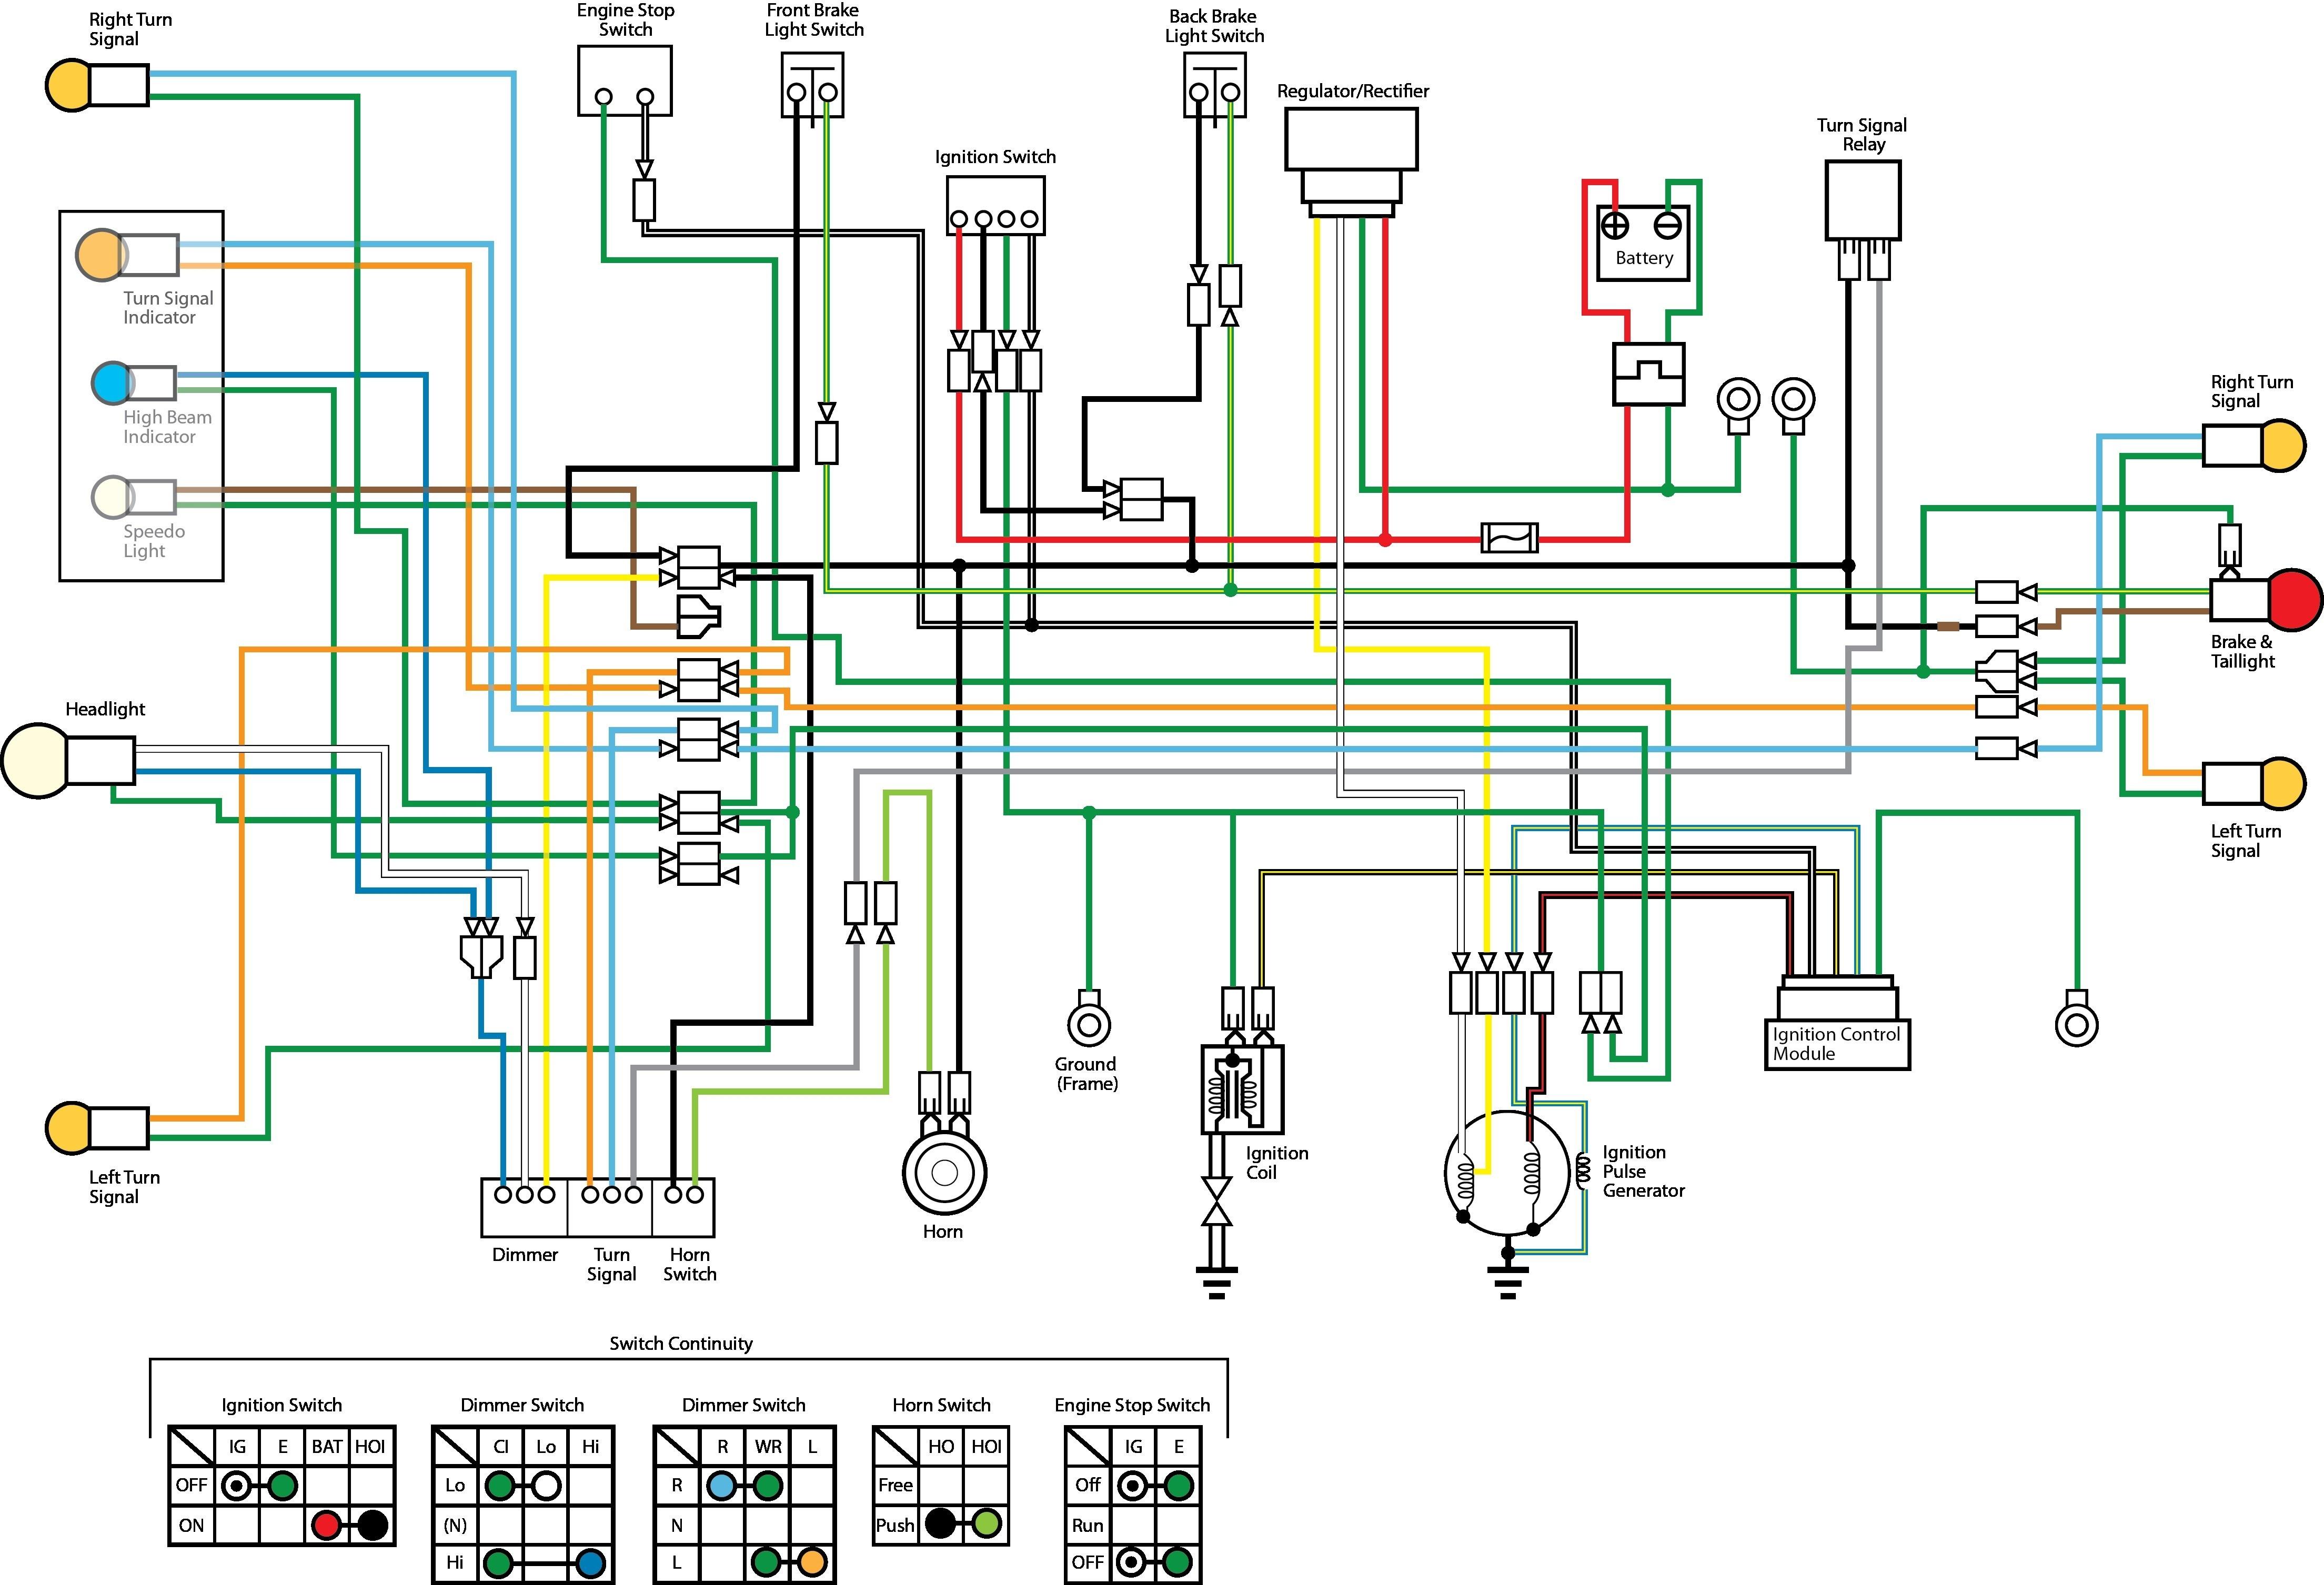 Motorcycle Wiring Diagram Wiring Diagram for Motorcycle Fresh Simple Motorcycle Wiring Diagram Picture